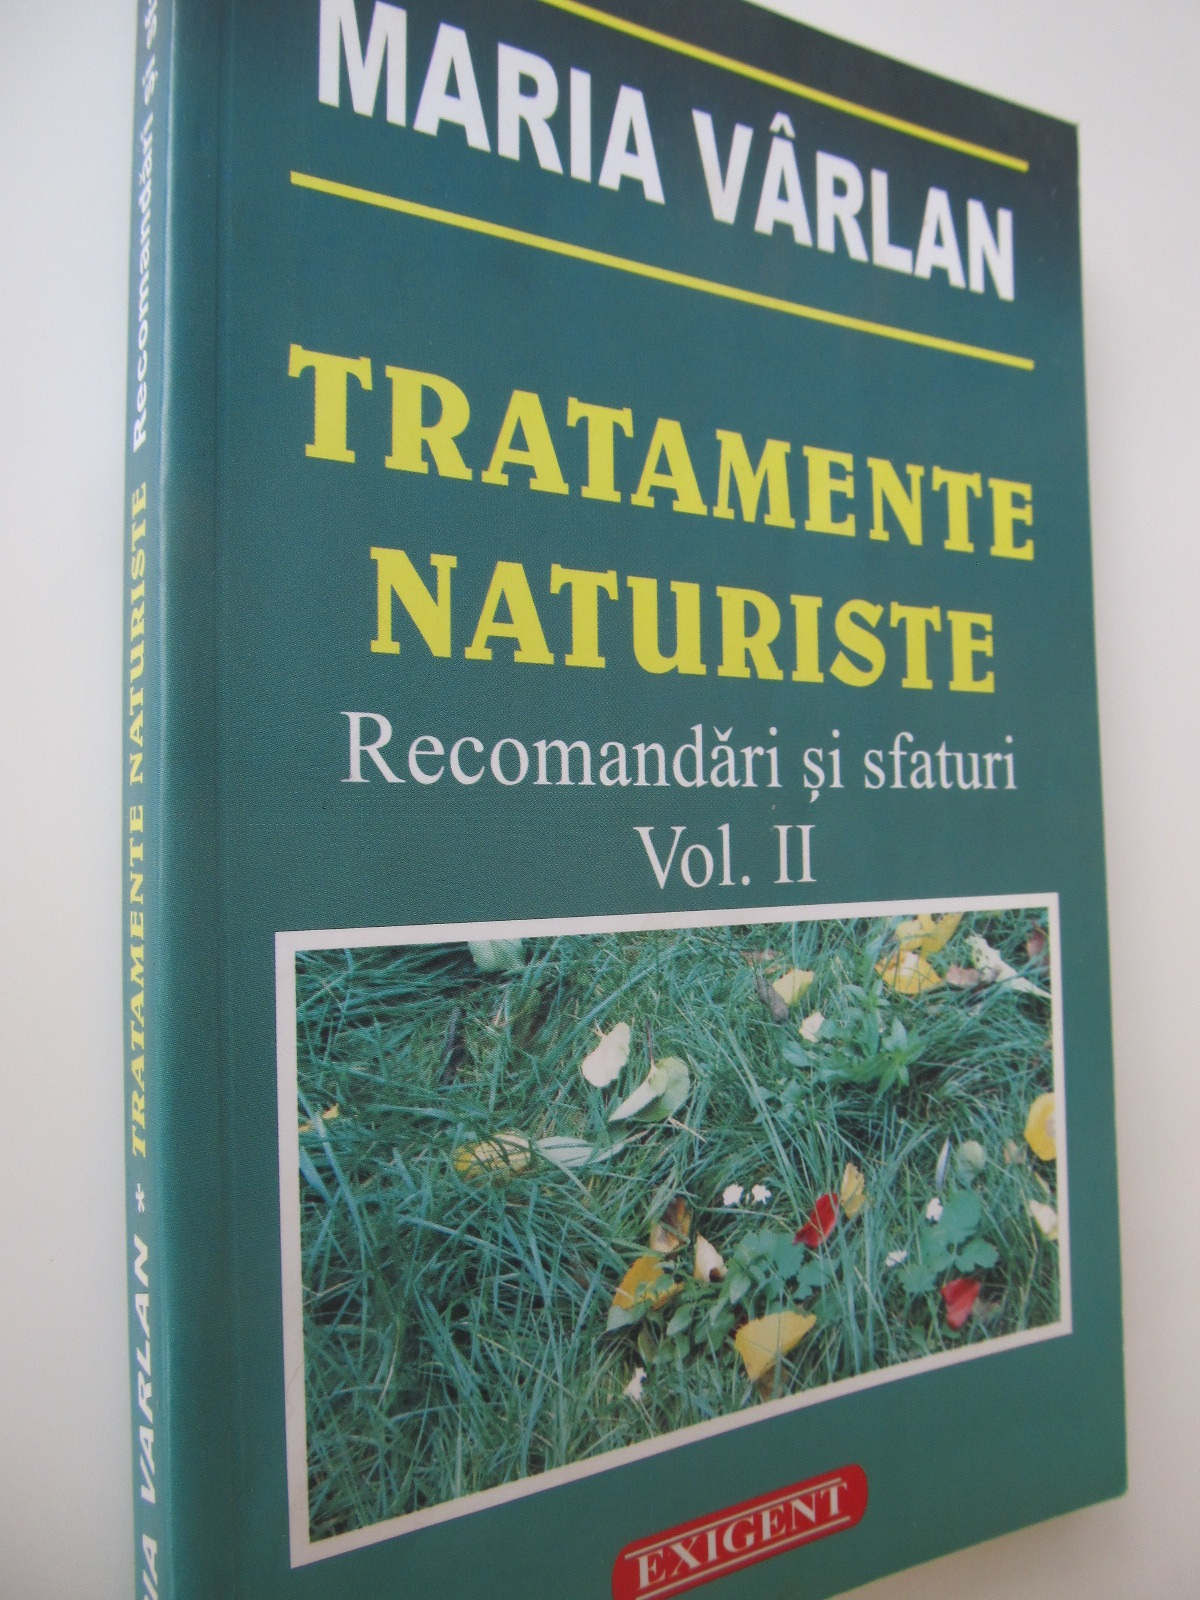 Tratamente naturiste - Recomandari si sfaturi (vol 2) - Maria Varlan | Detalii carte